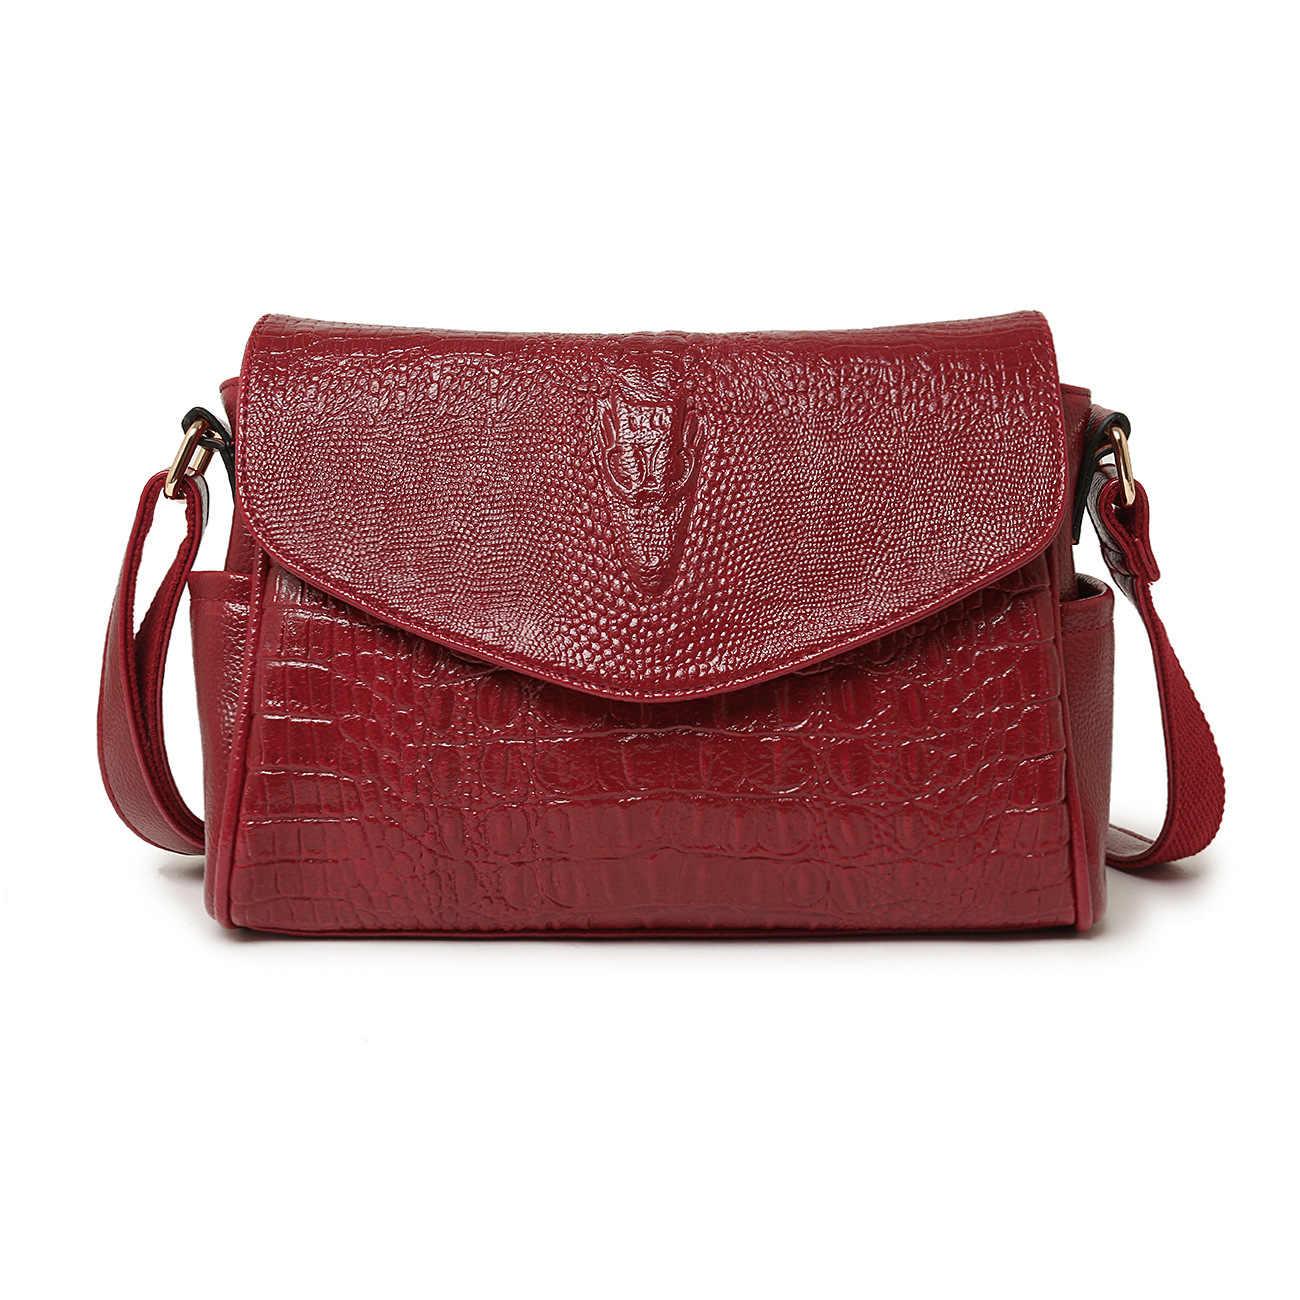 b7105a667bdd Women's Small Handbags Crocodile Alligator Synthetic Leather ...